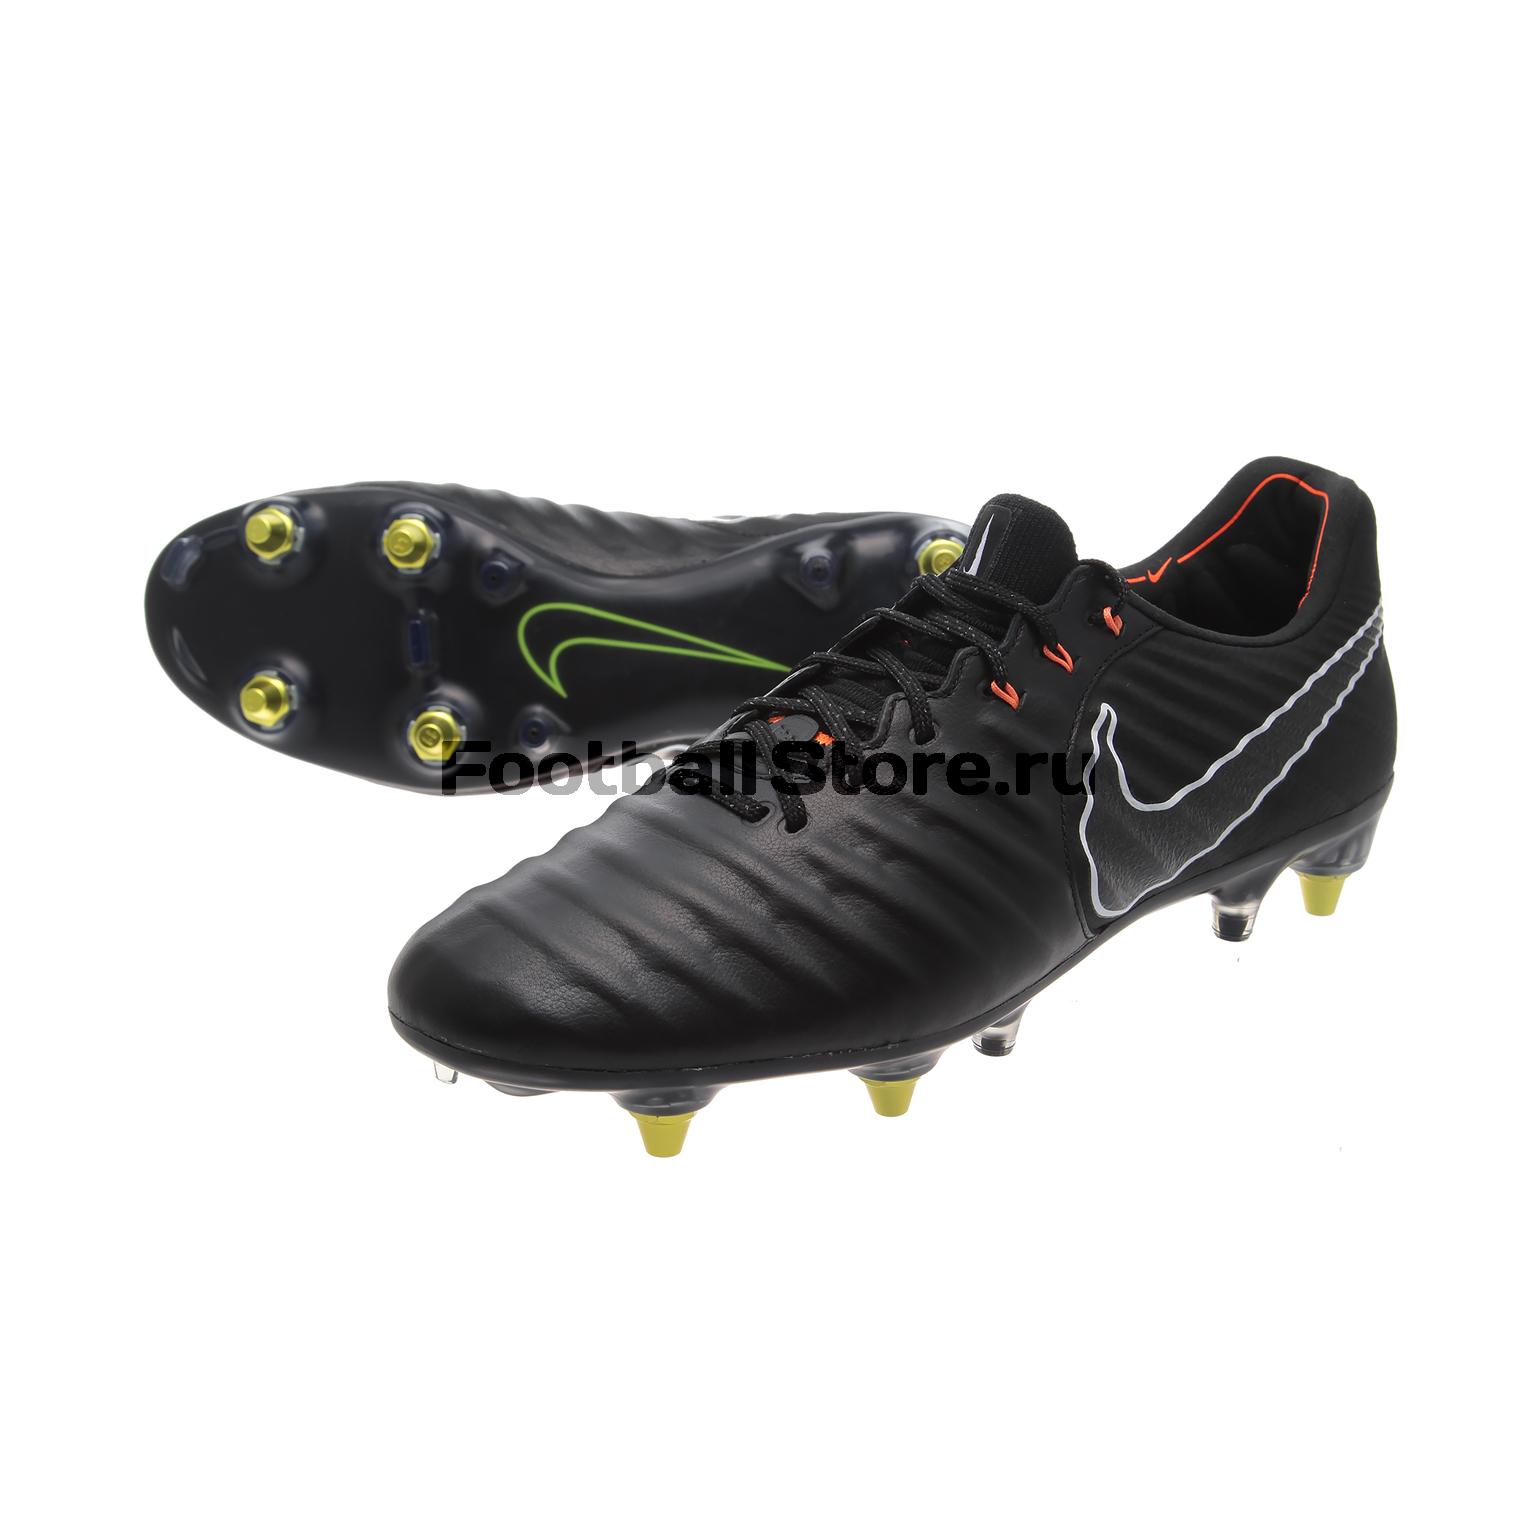 Игровые бутсы Nike Бутсы Nike Legend 7 Elite SG-Pro AC AH7253-080 schecter damien elite 7